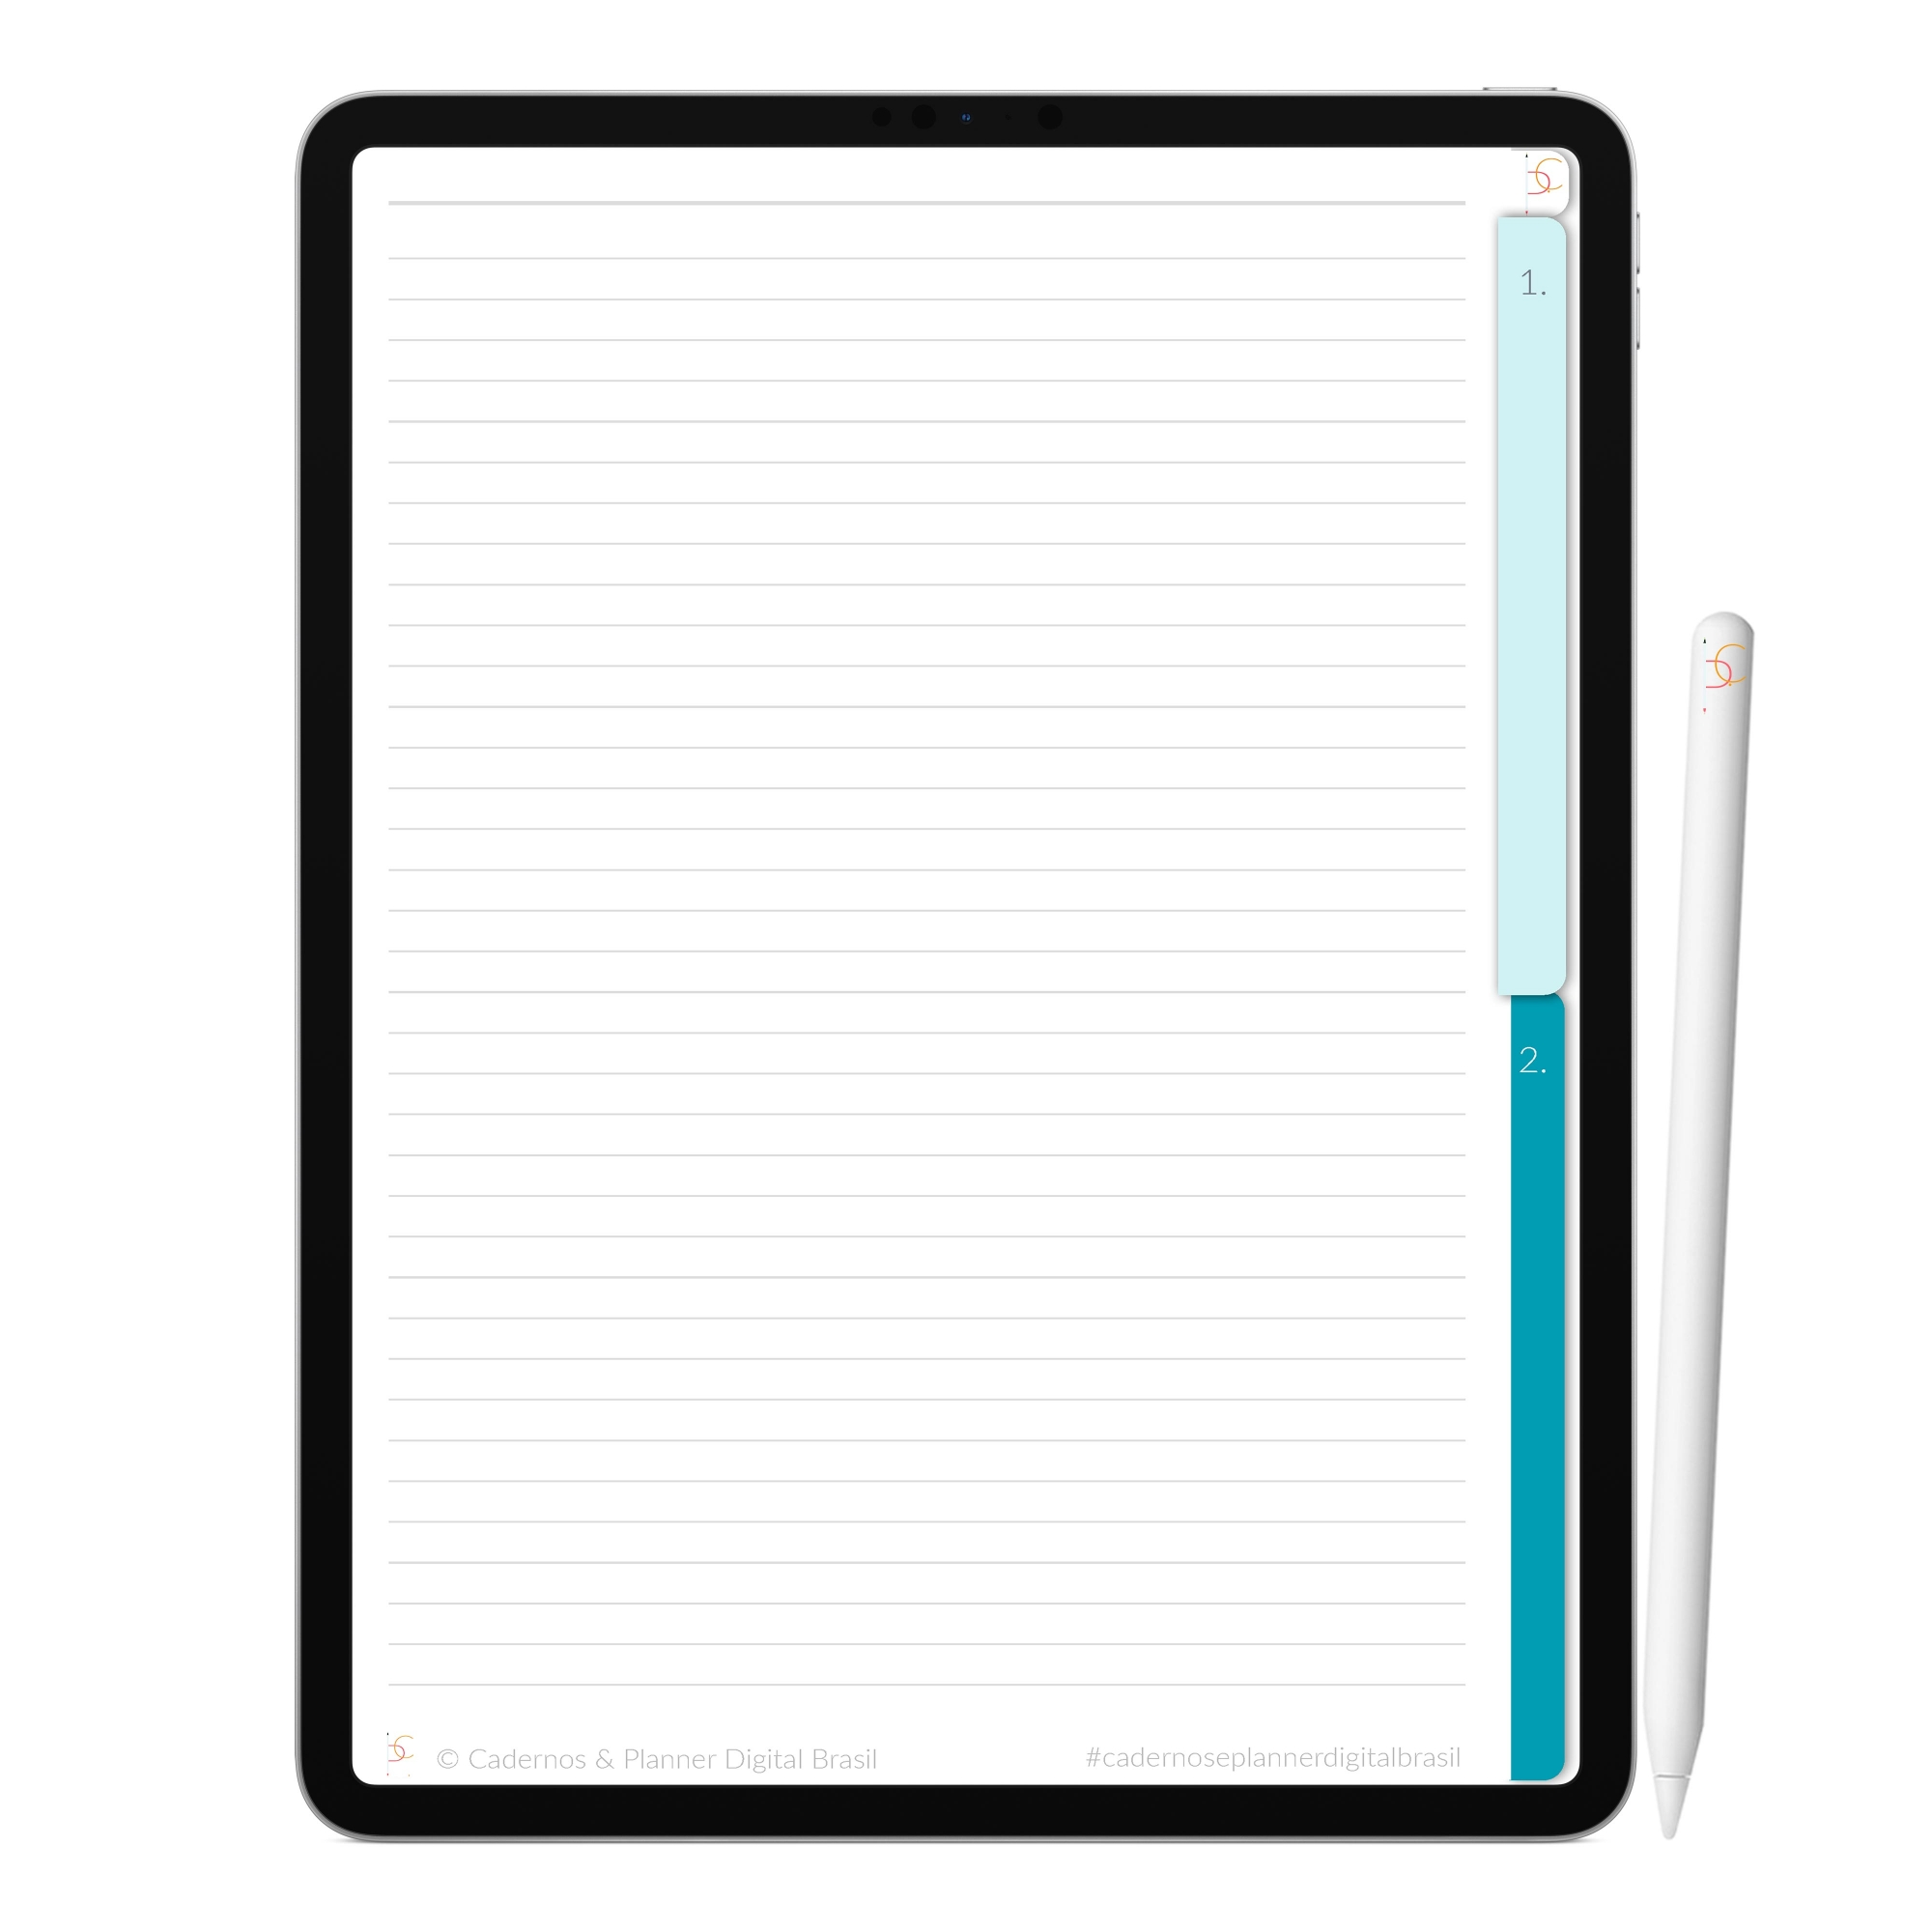 Caderno Digital Dream Sonhe | Duas Matérias Interativo| iPad Tablet | Download Instantâneo